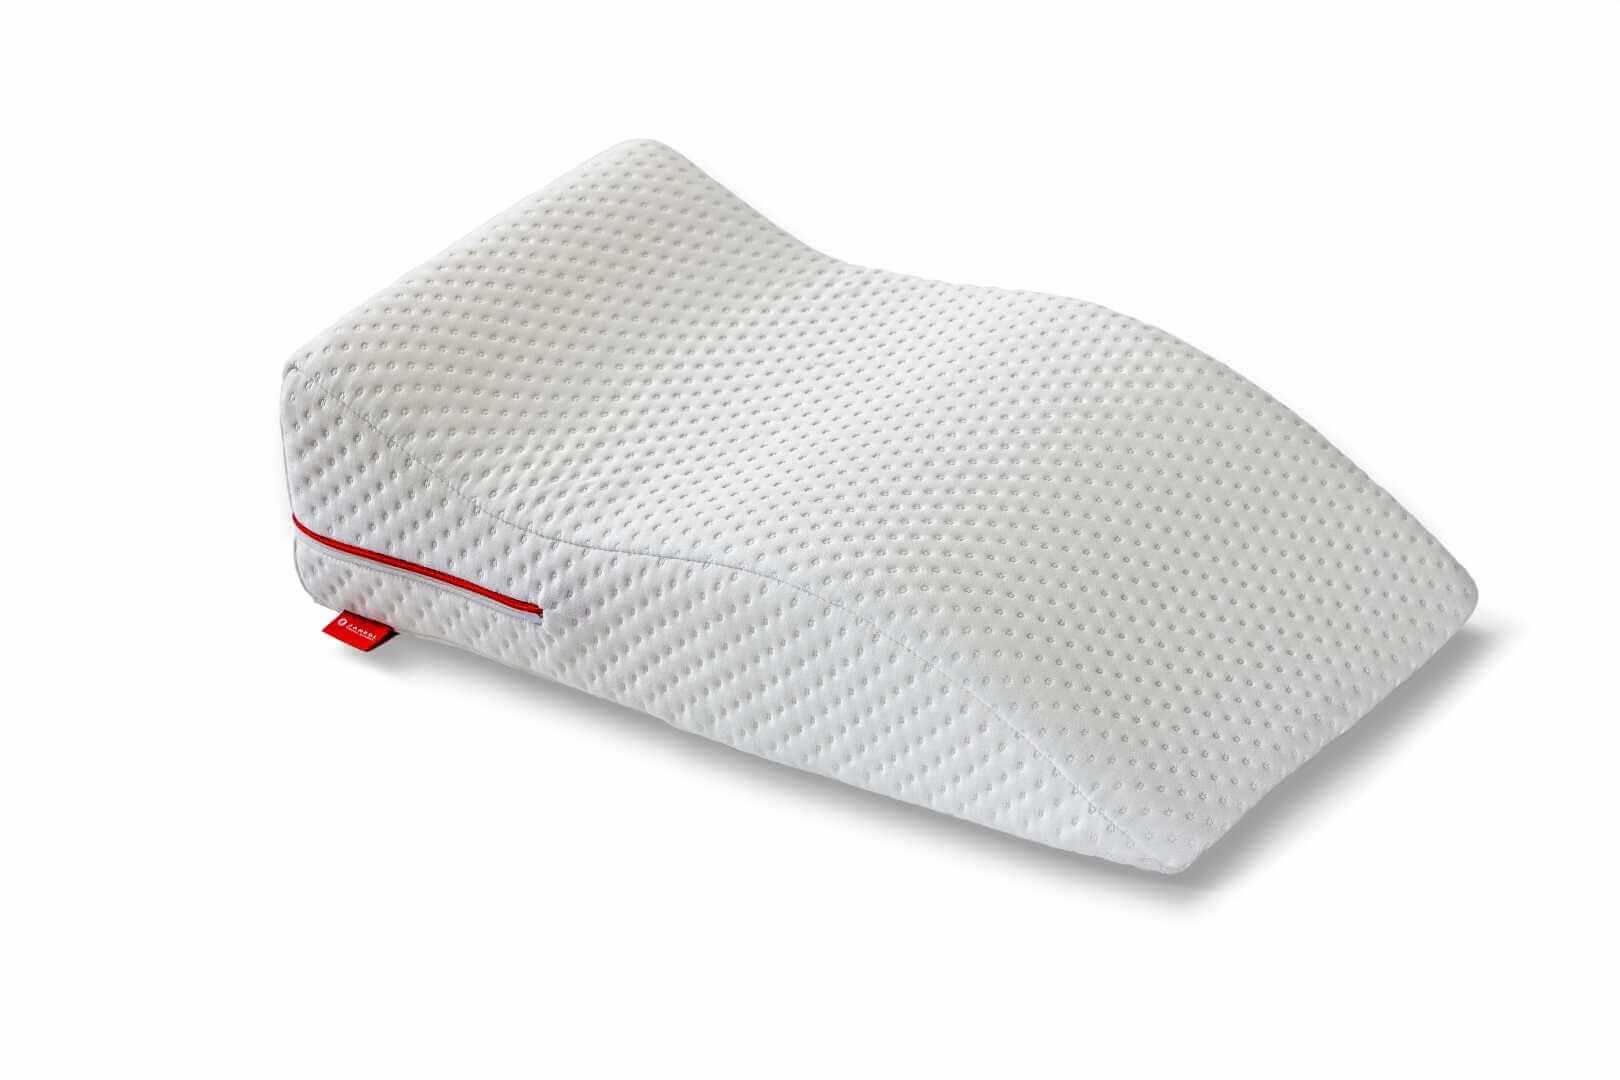 Poduszka Relaksacyjna podnogi